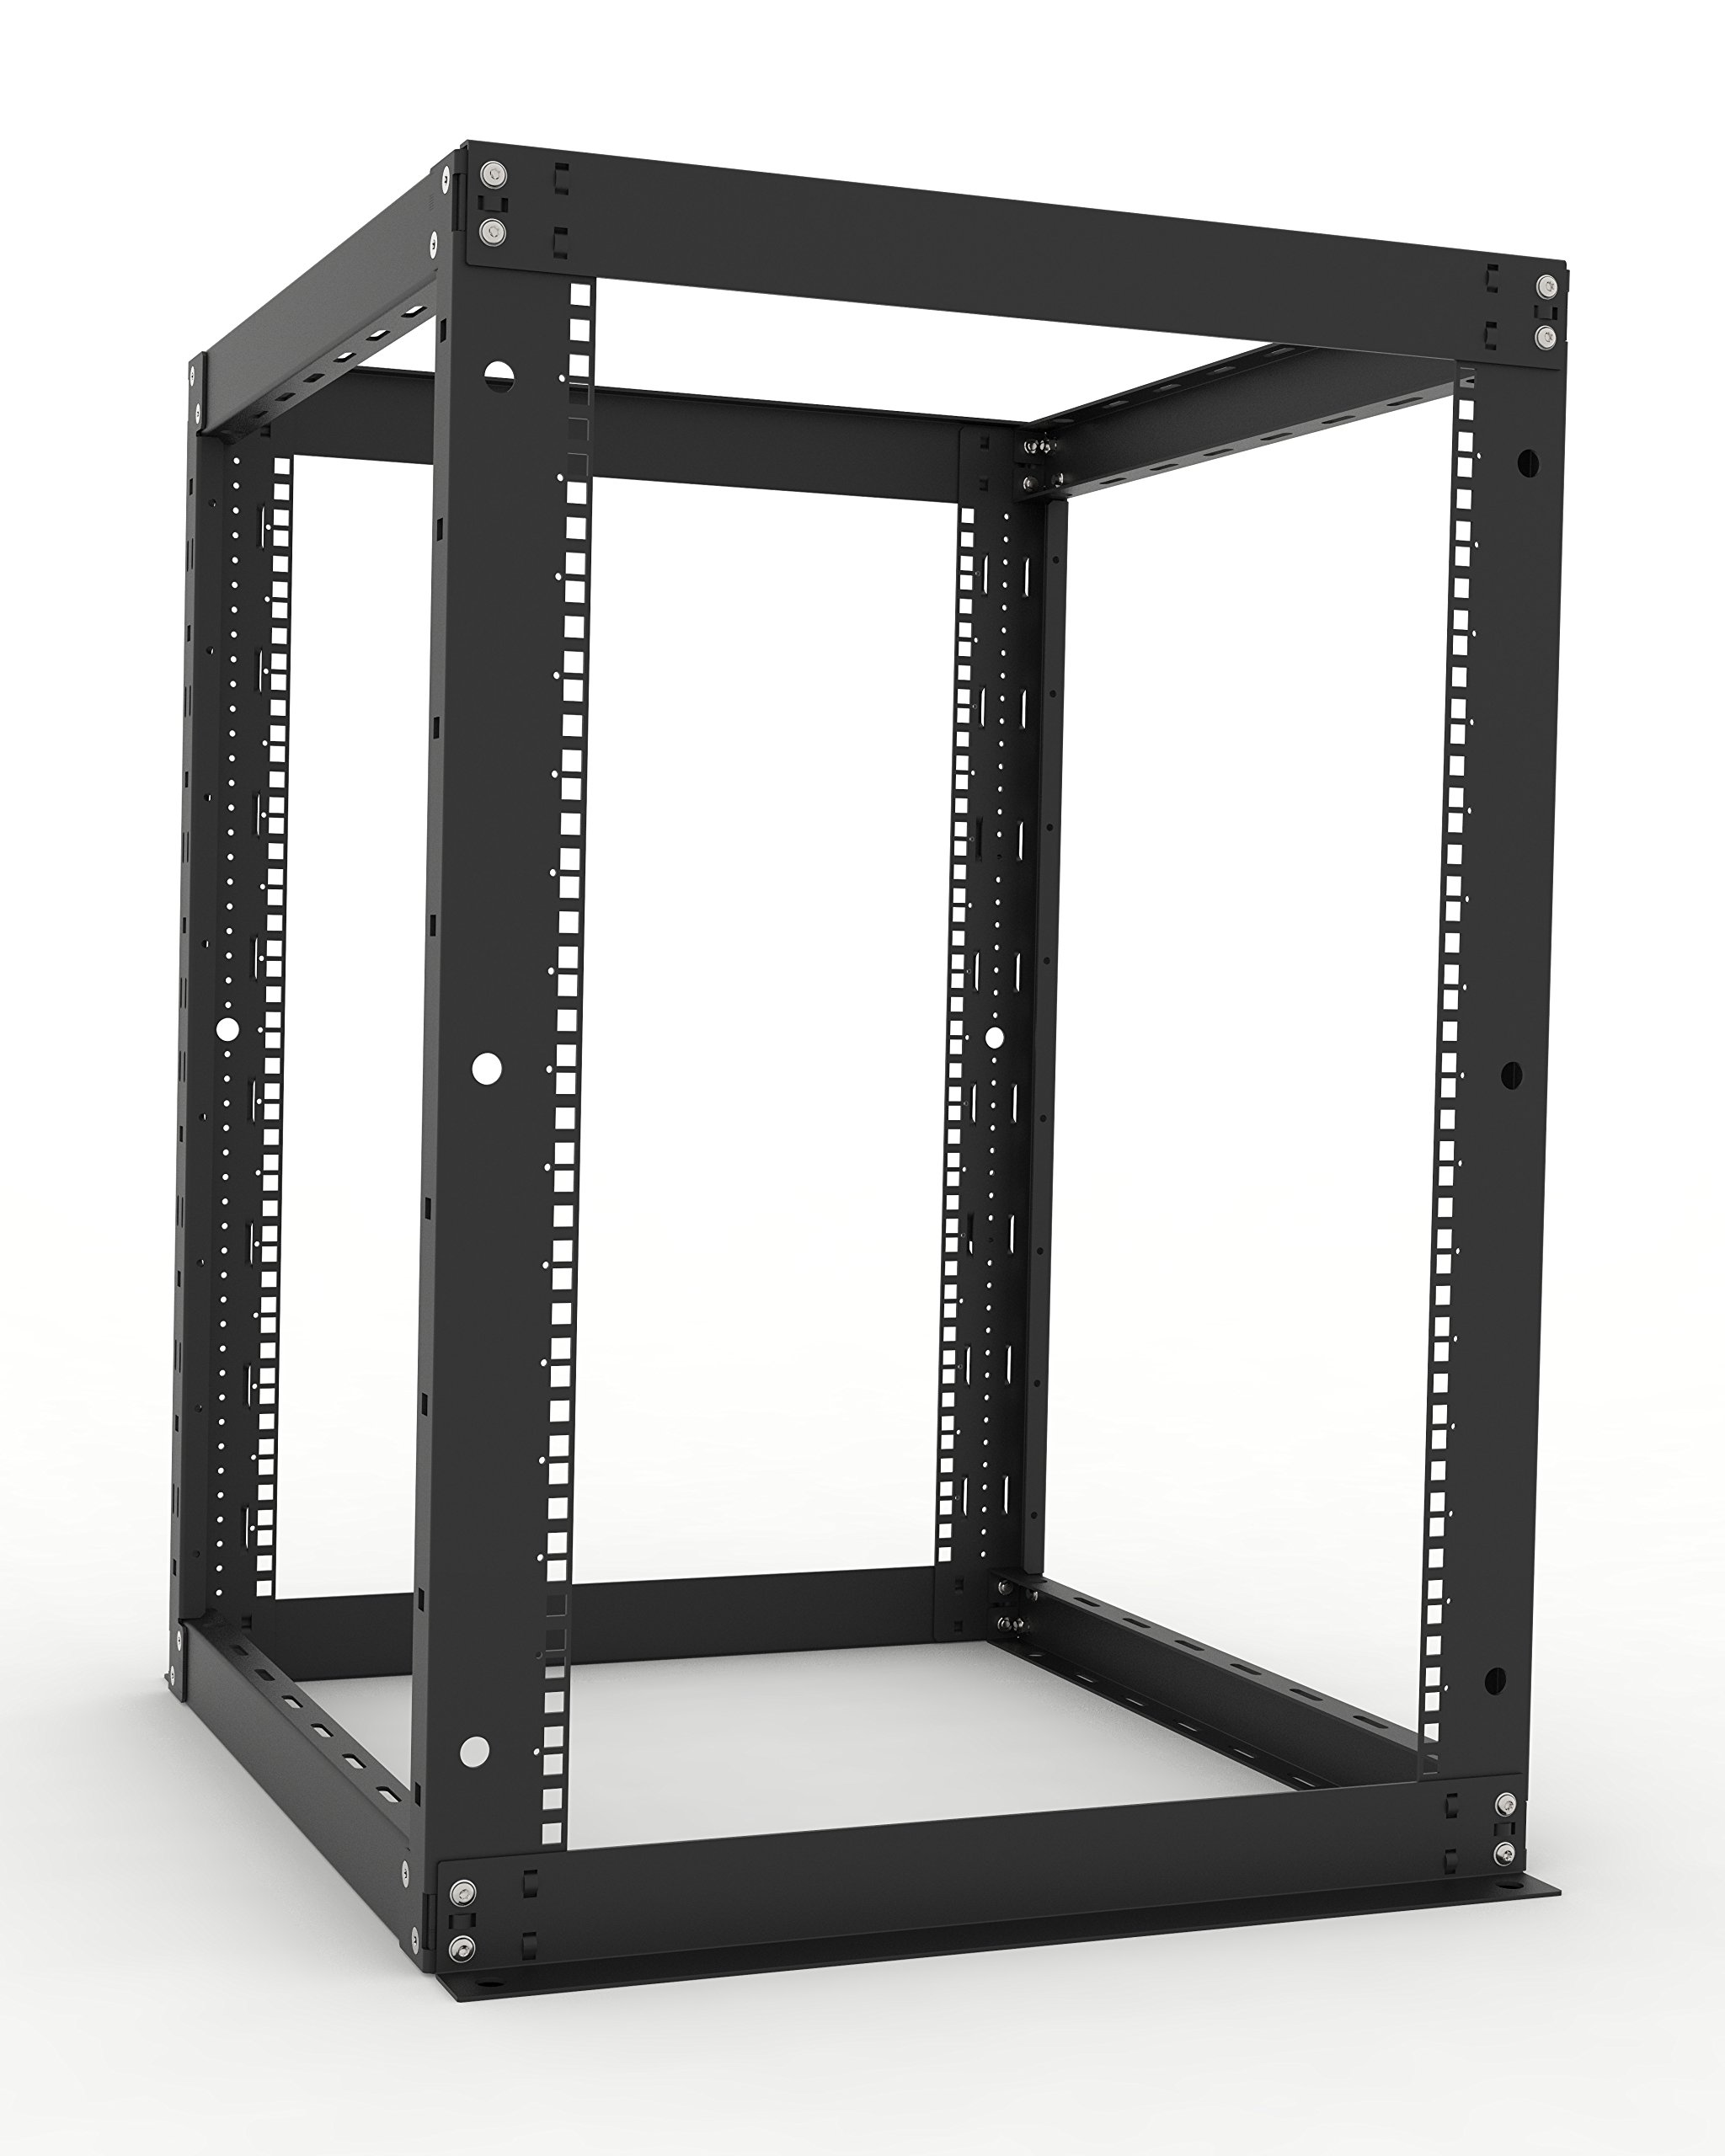 RACKSOLUTIONS Open Frame Rack (29'' - Server Depth, 16U)